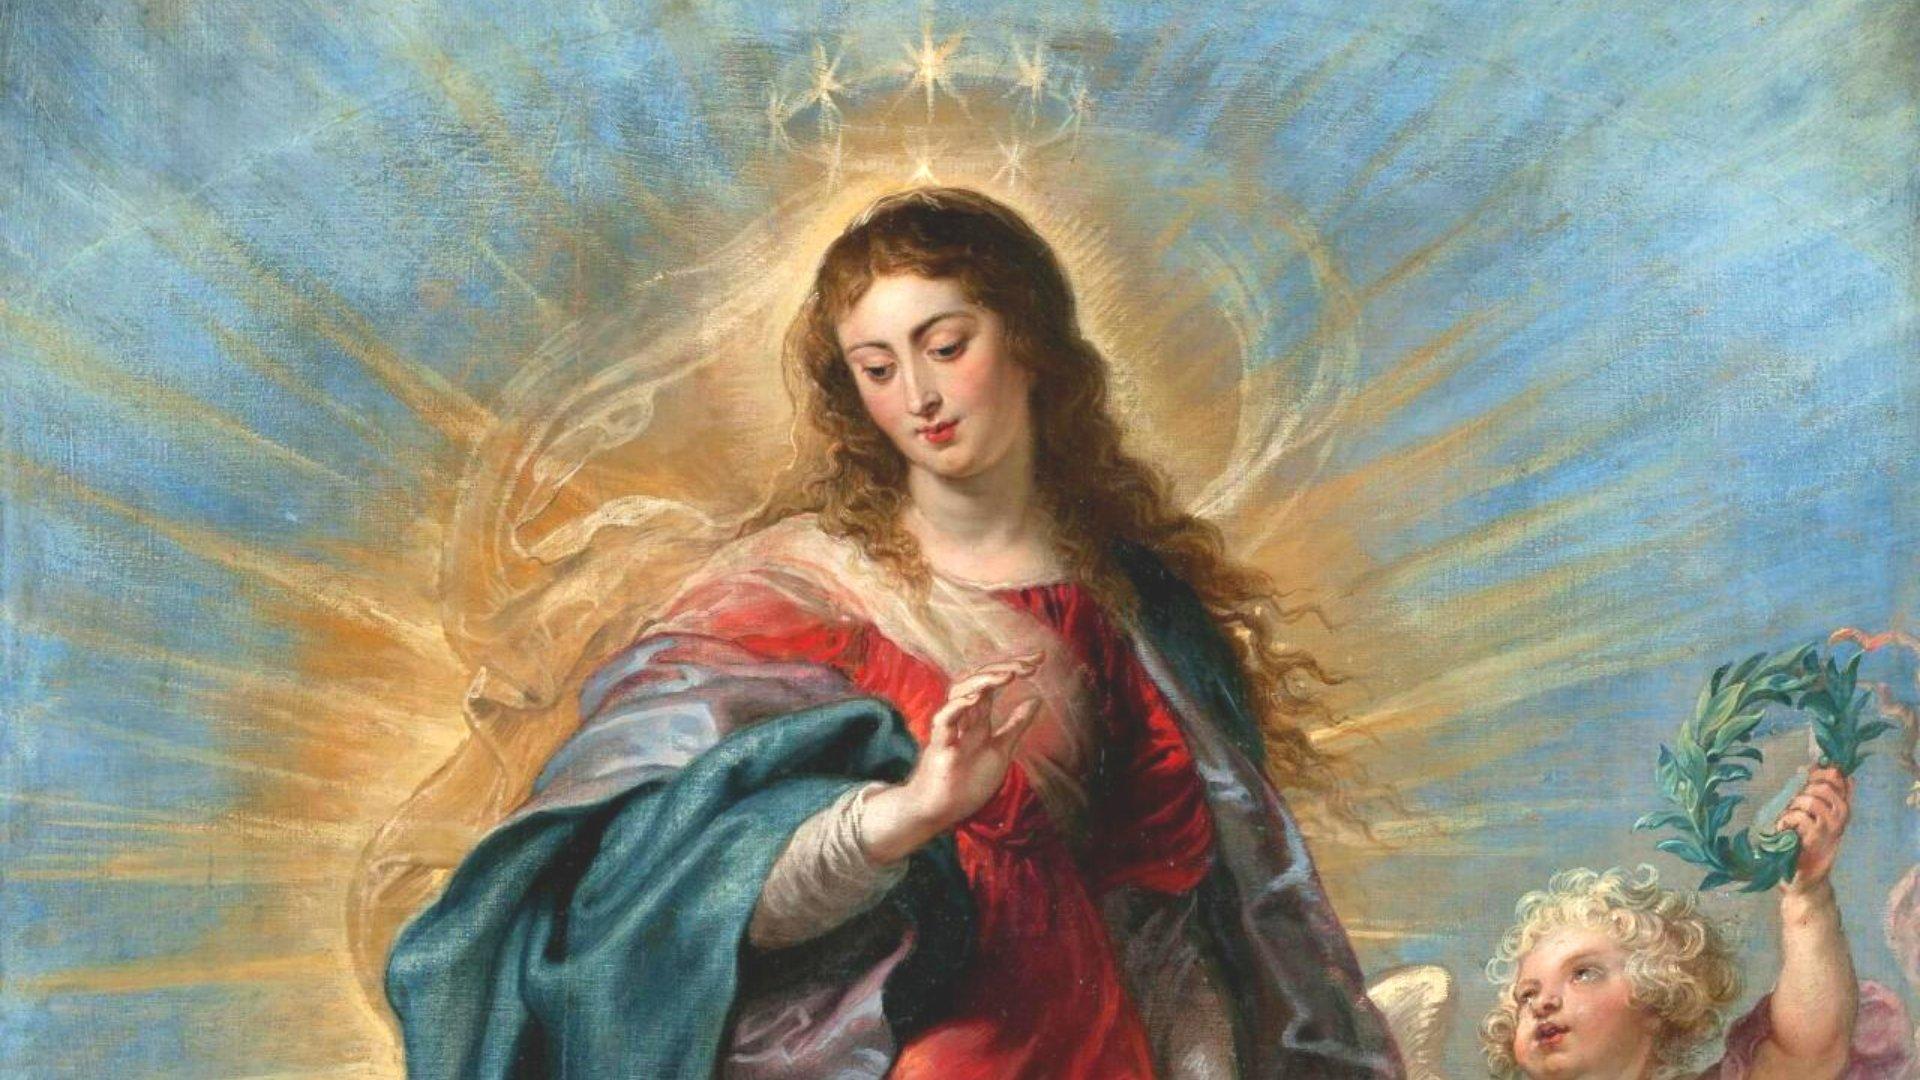 Santíssima Virgem Maria